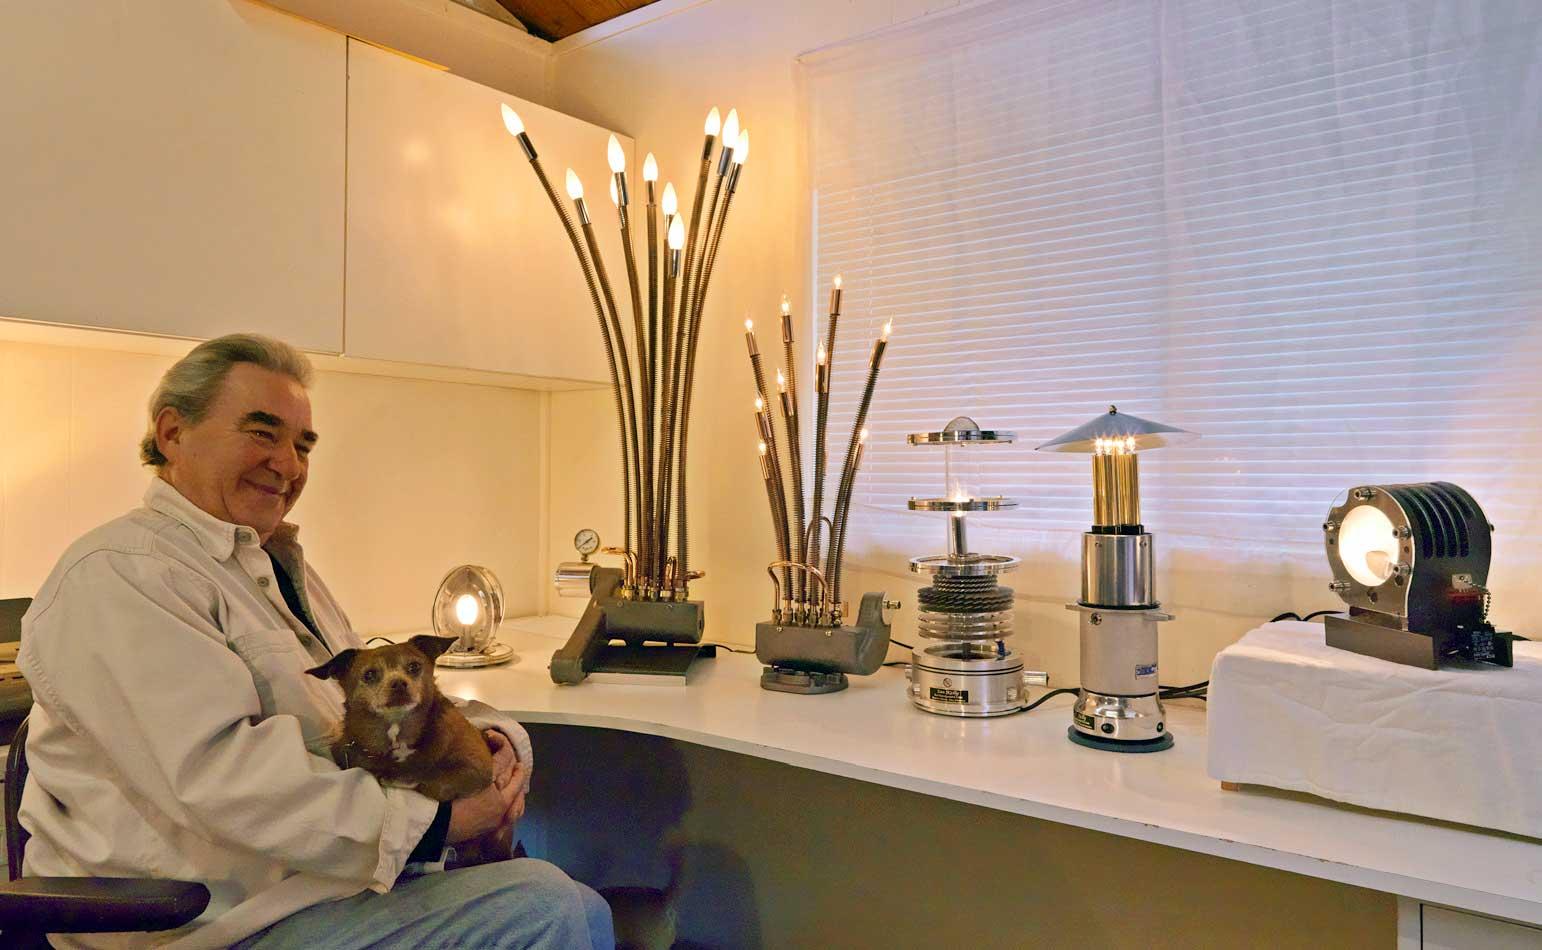 Ex Tech Lamps Emblage Art Lighting Fixtures Rescues